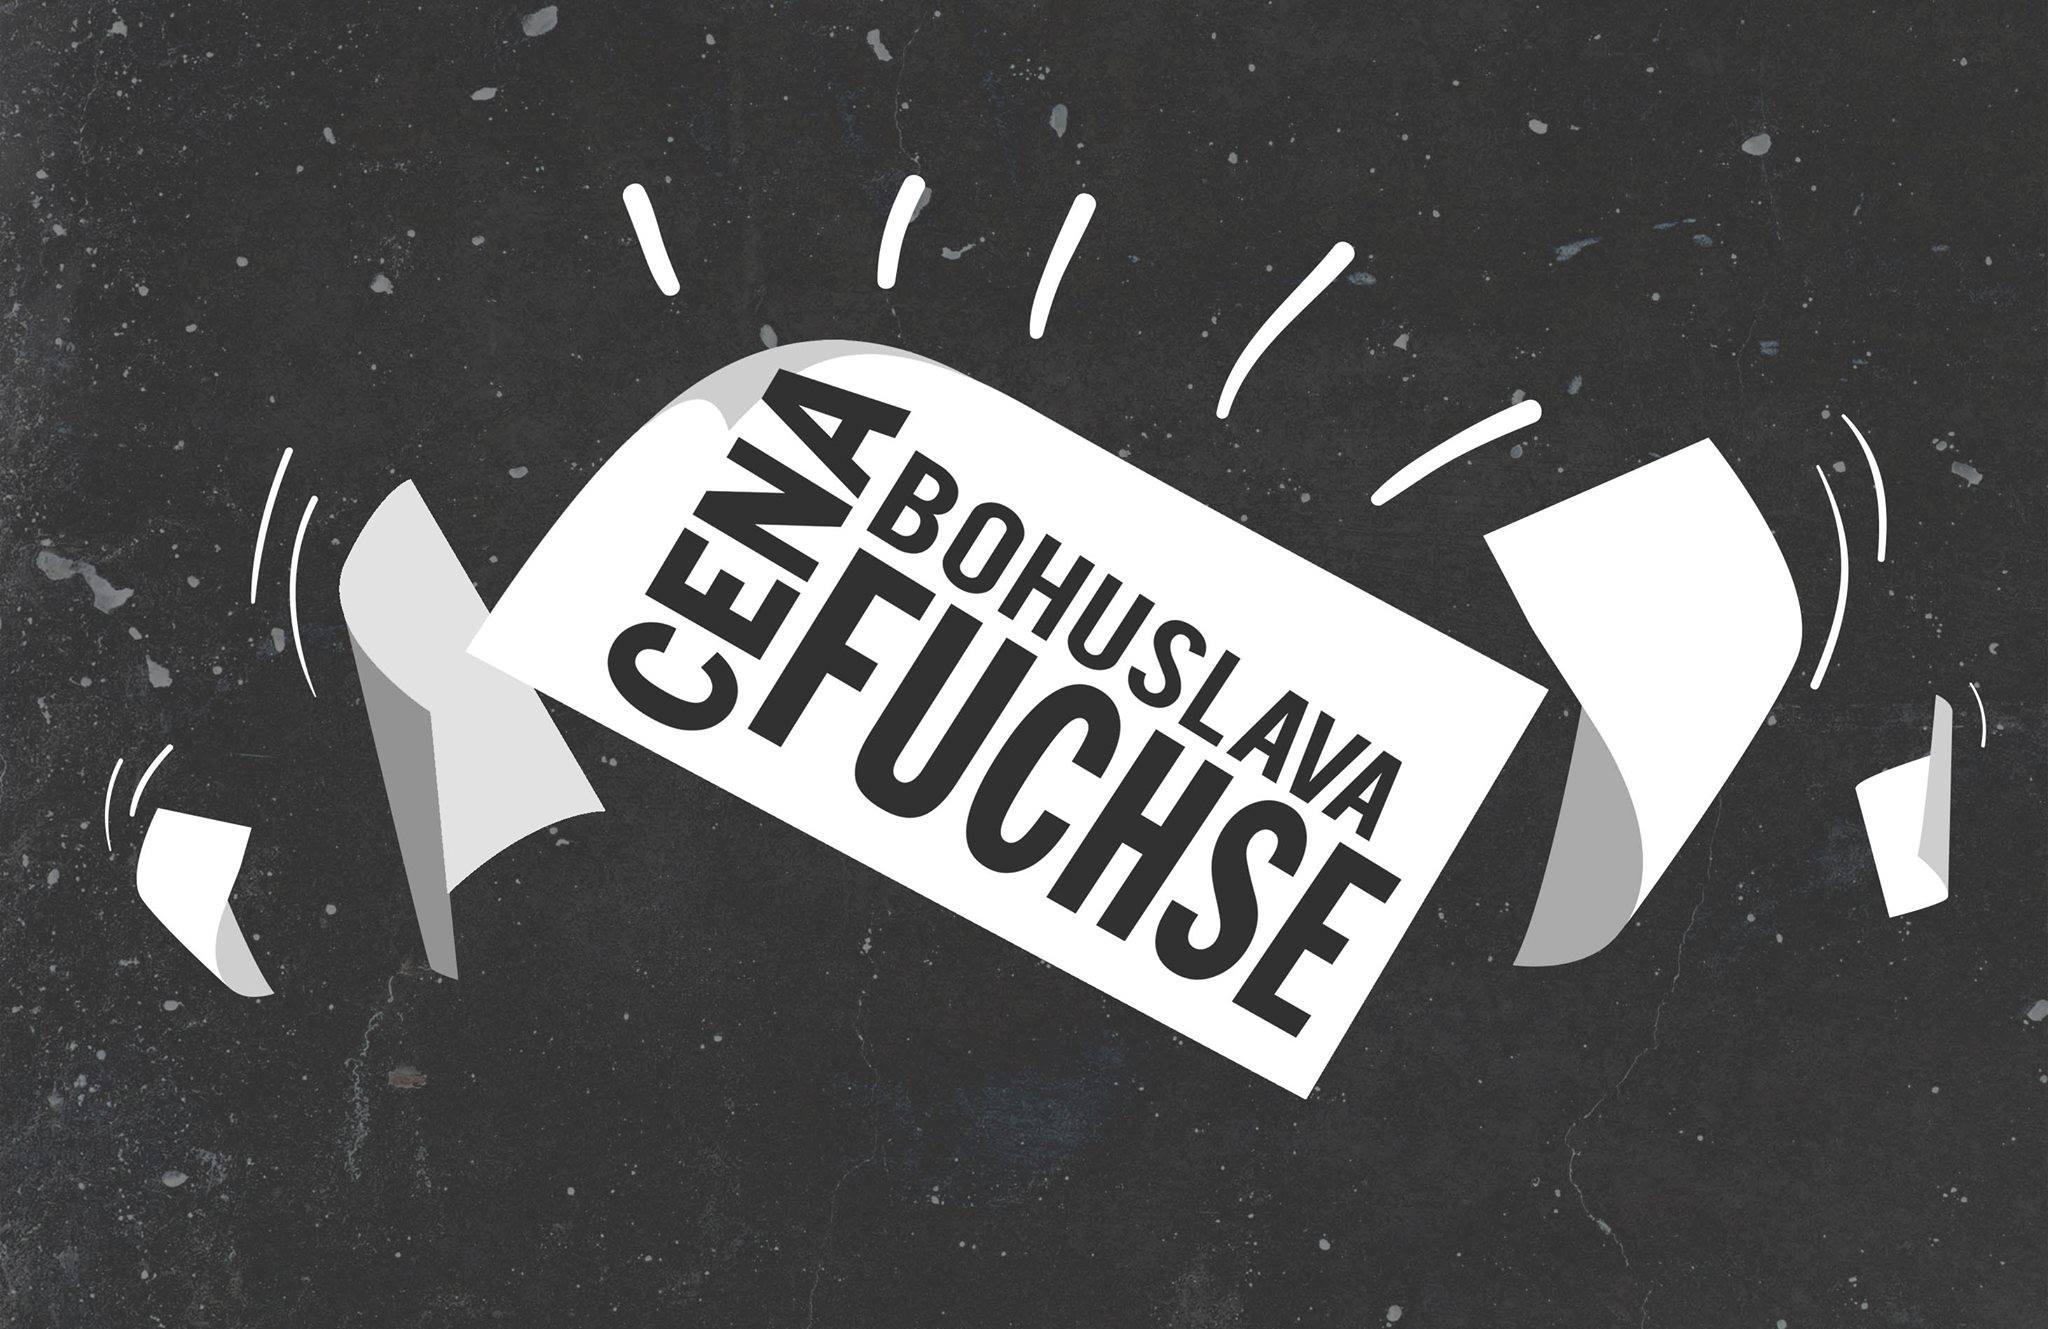 25. 5. 19:00 – 11 Cena Bohuslava Fuchse